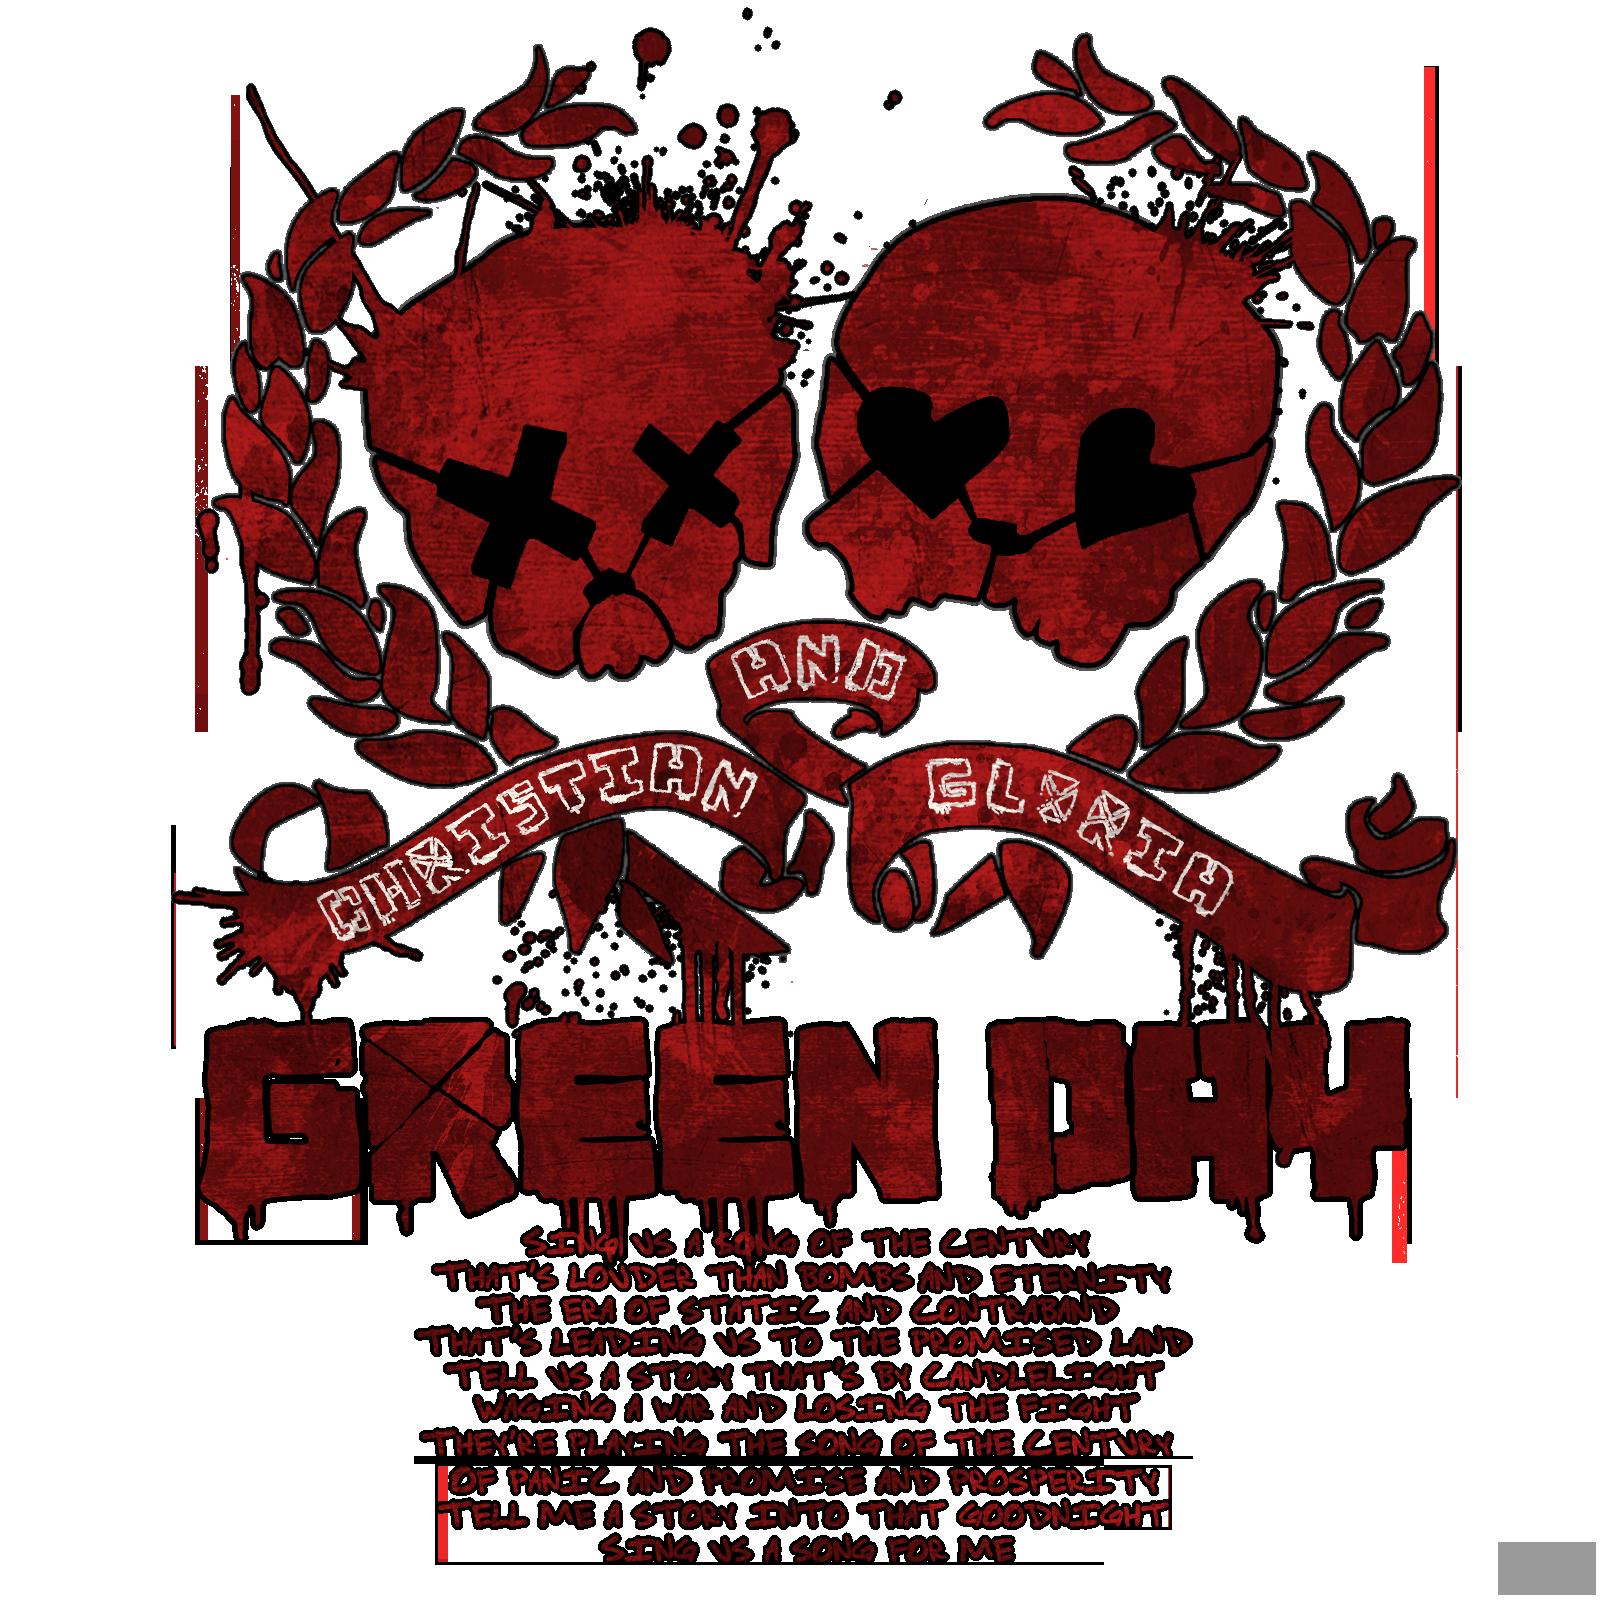 Green Day Photo Song Of The Century Lyrics 2000 2000px Green Day Tattoo Green Day Green Day Billie Joe